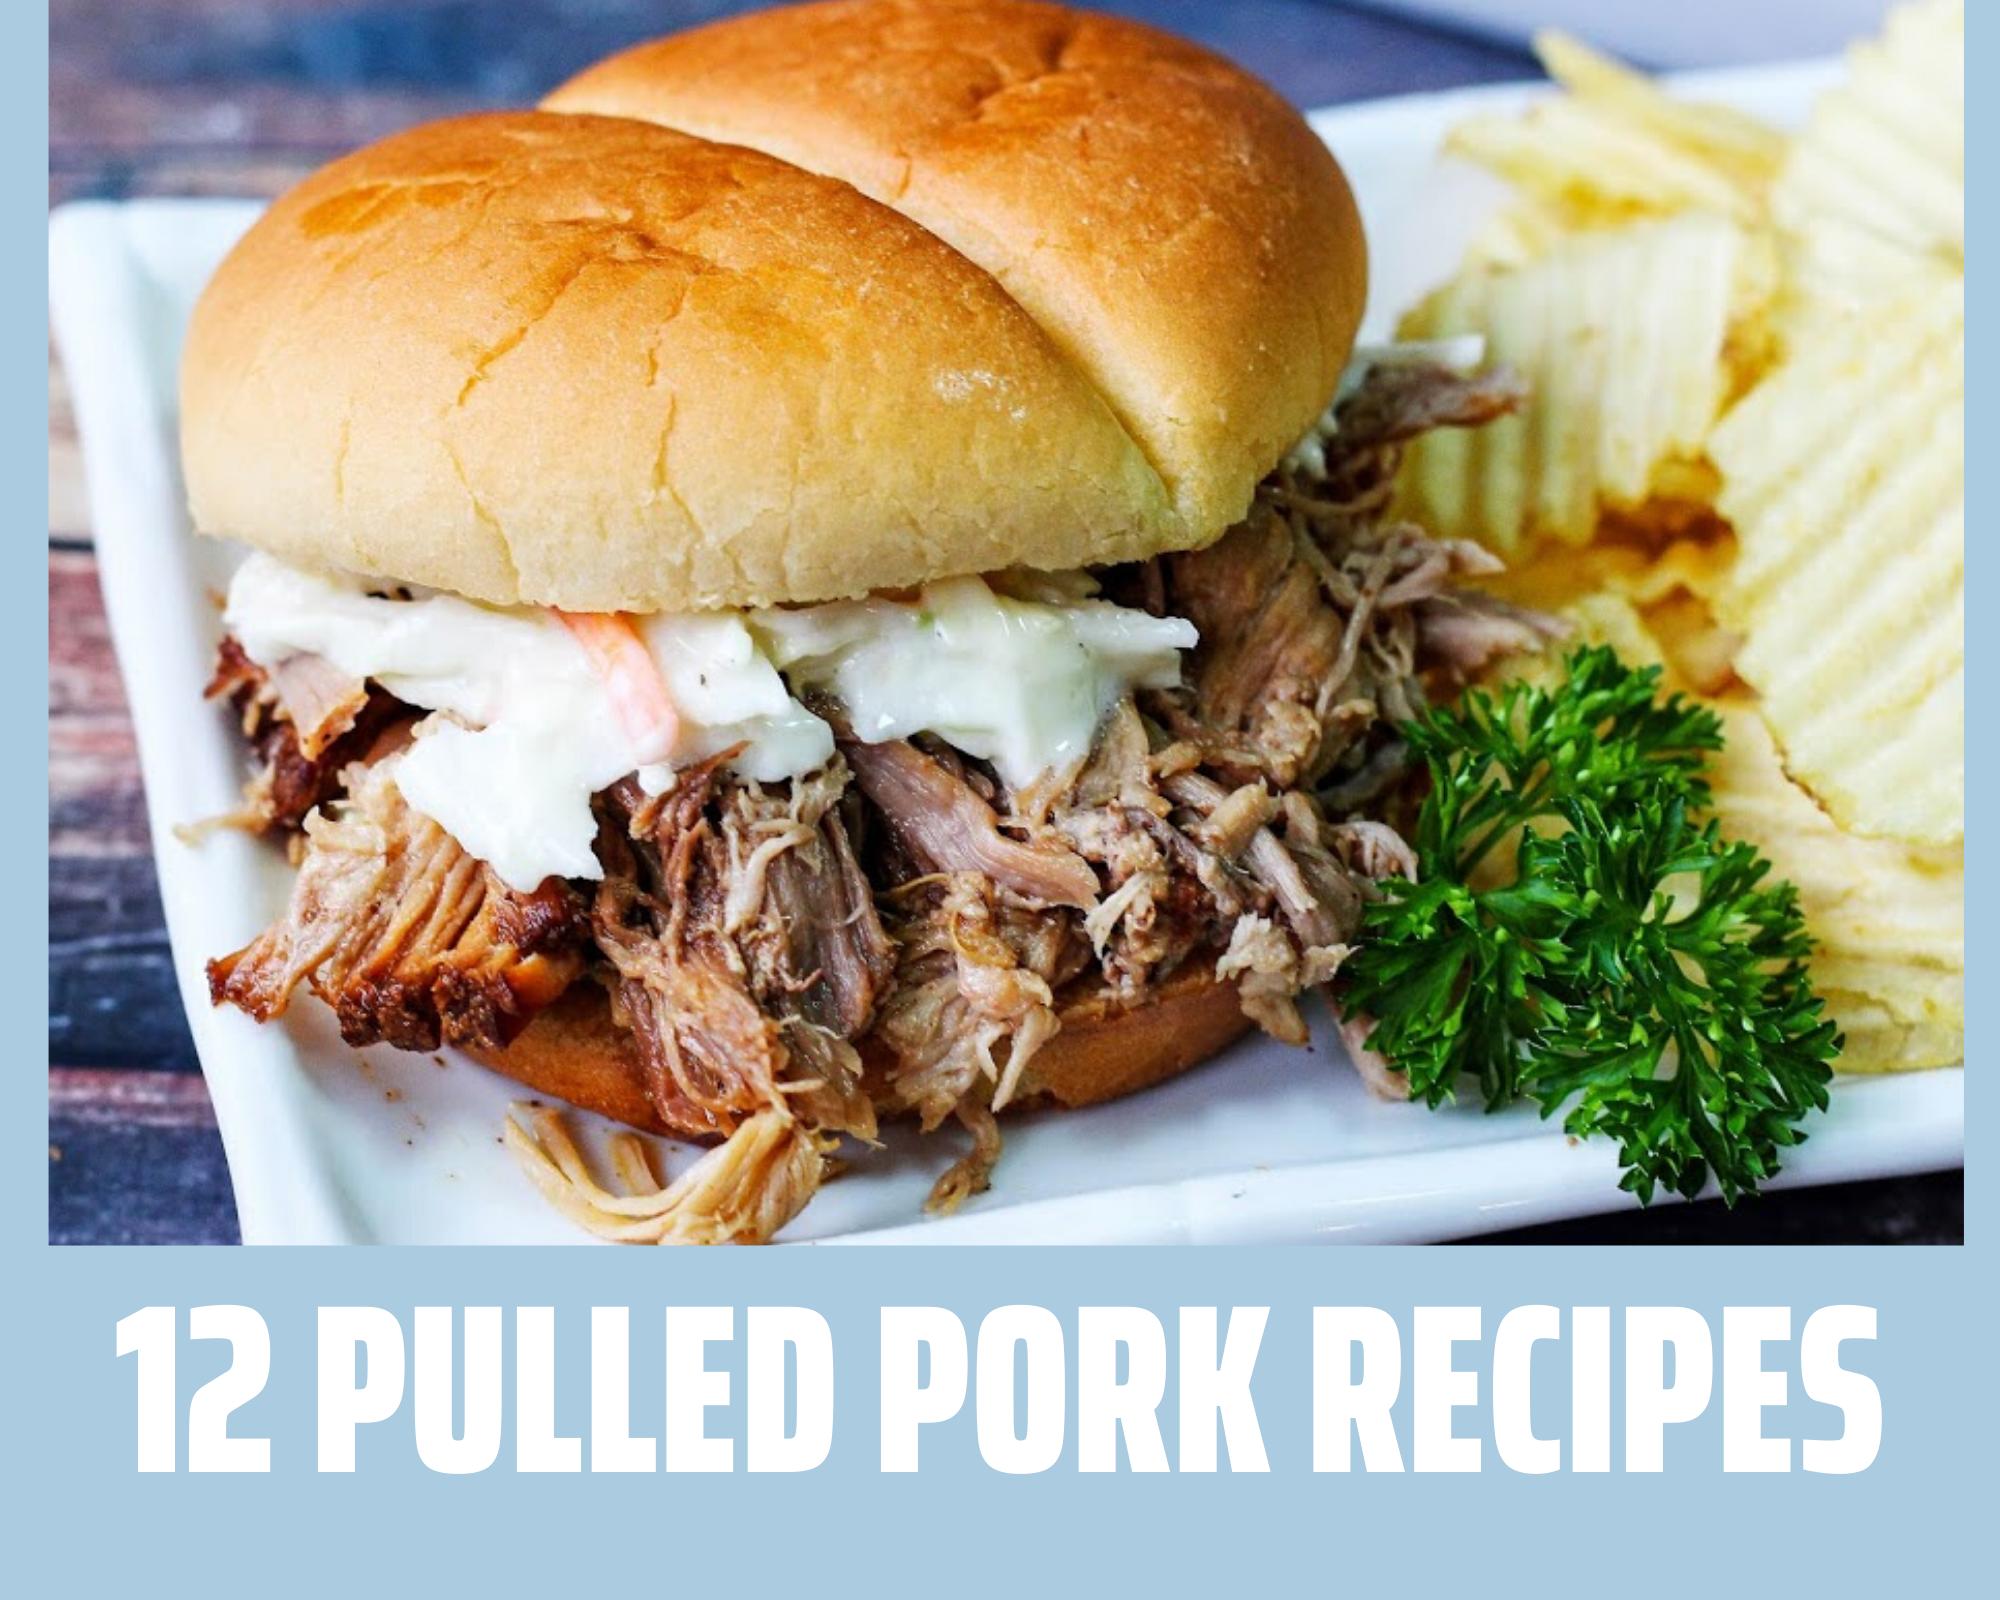 Pulled pork sandwich recipes